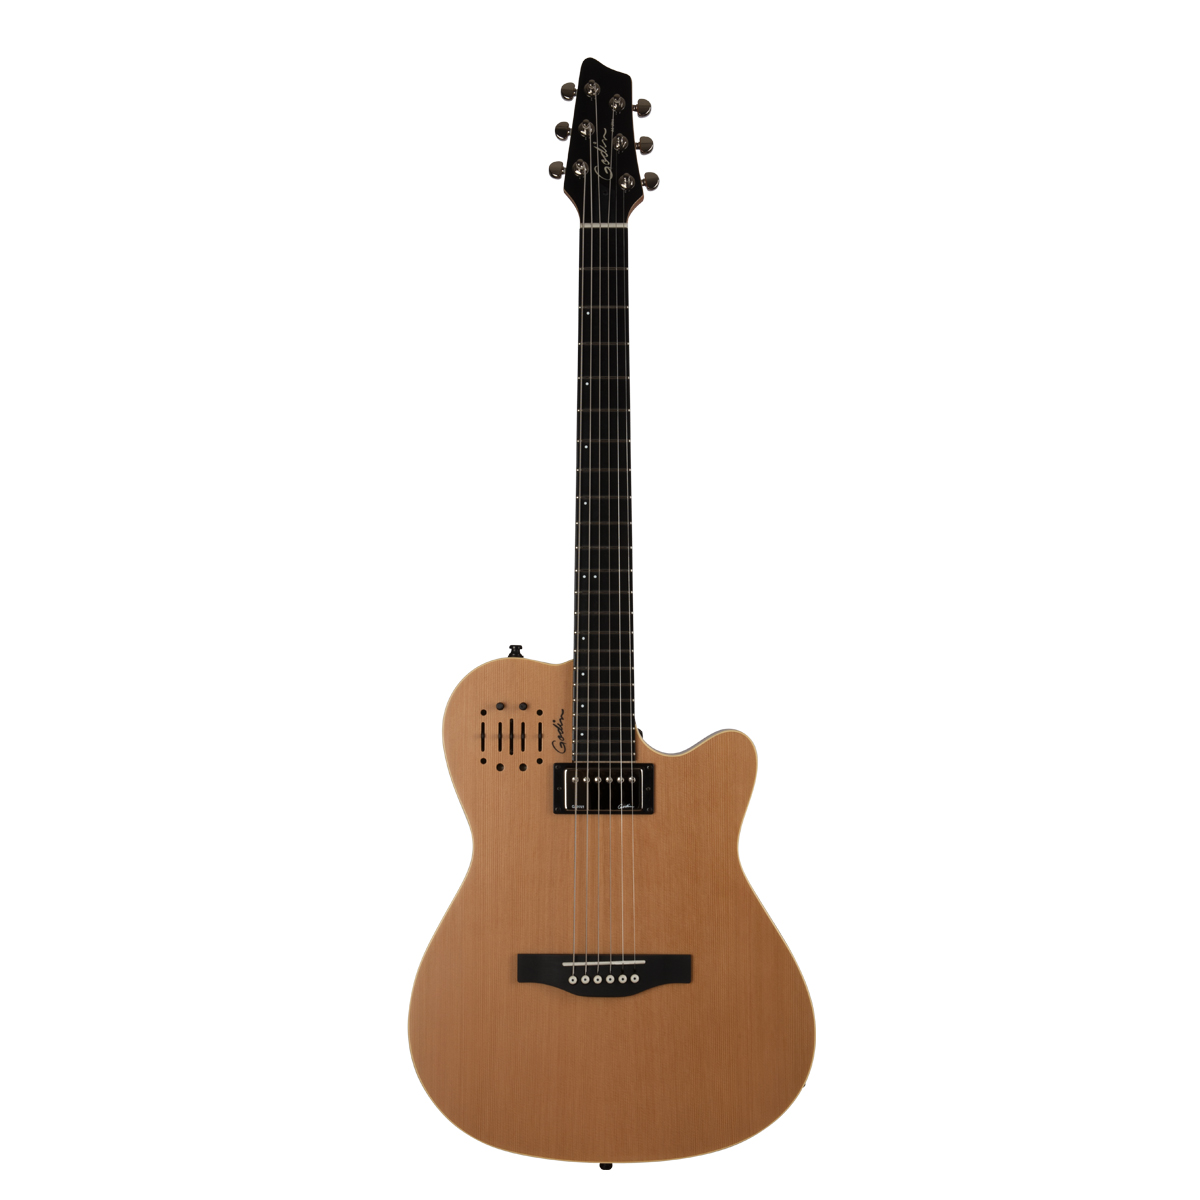 Godin 30293 A6 Ultra Natural Acoustic Electric Guitar